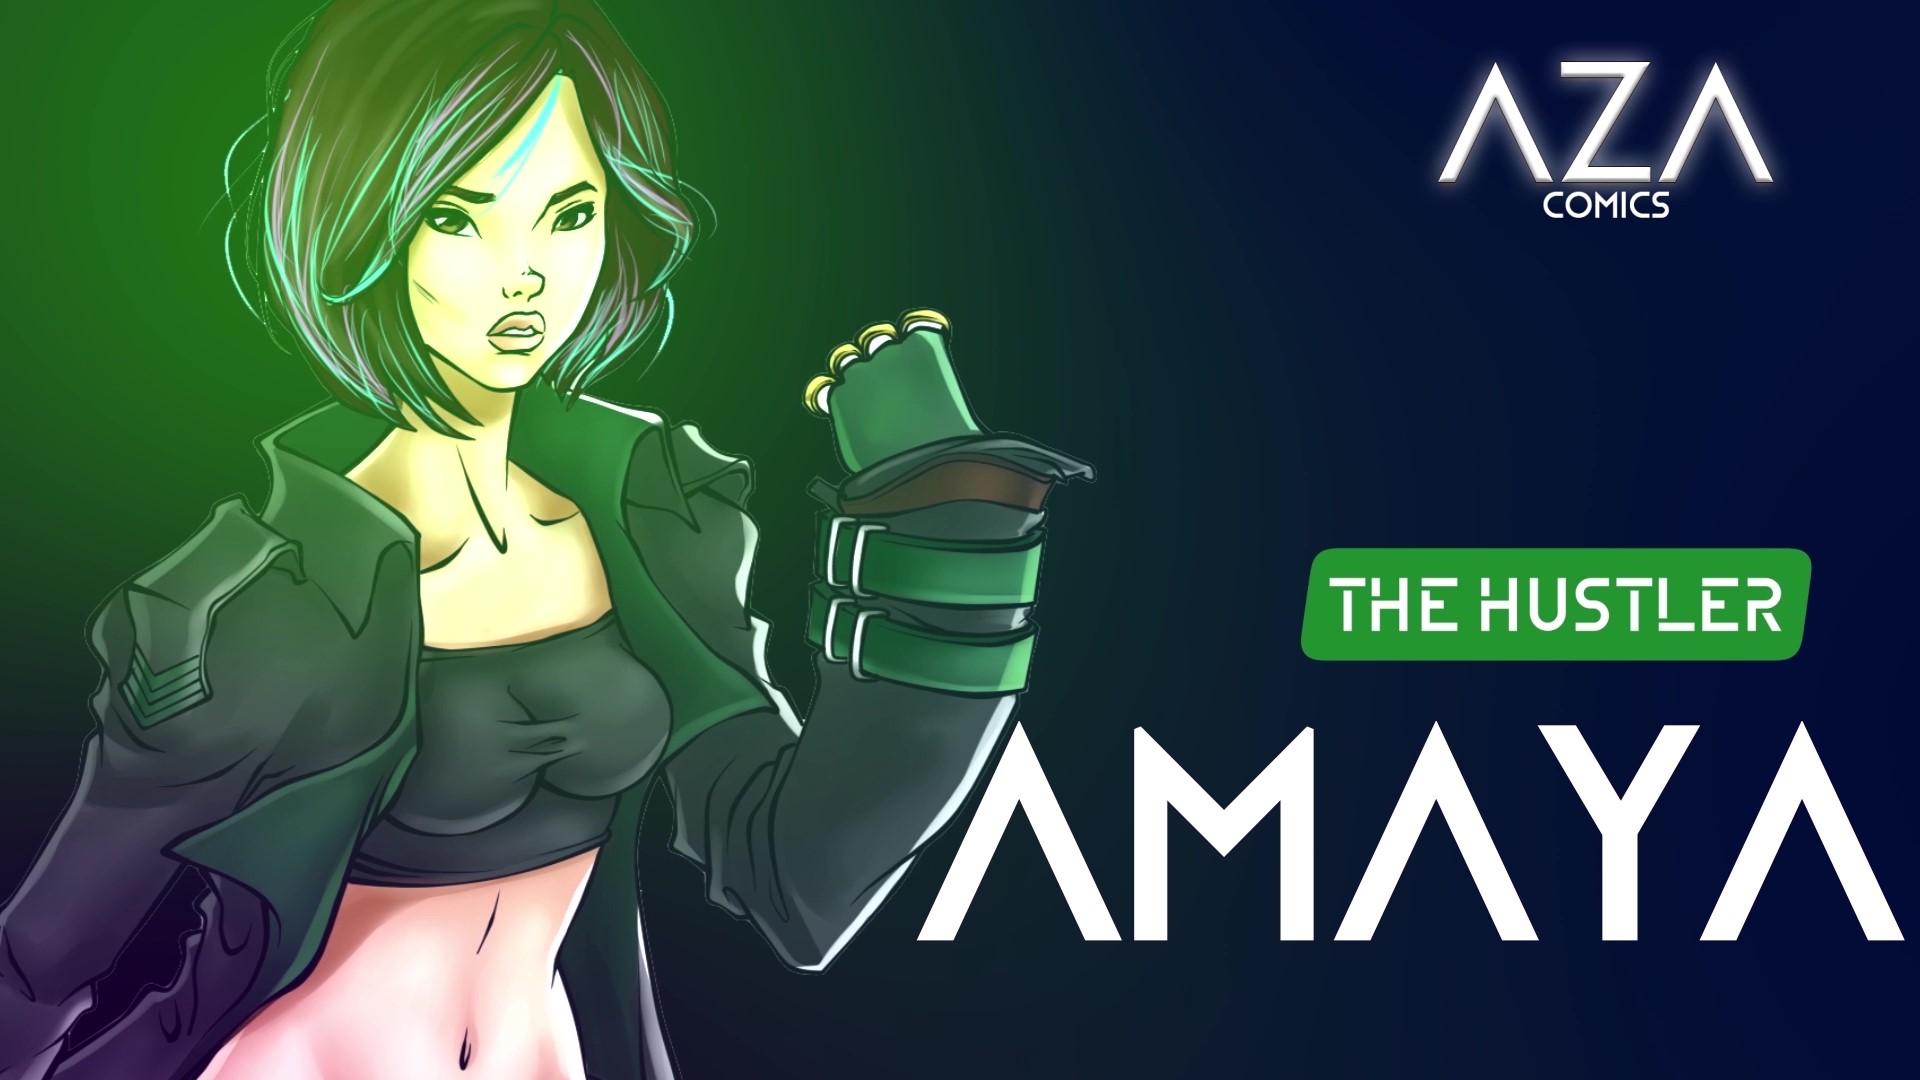 Meet Amaya